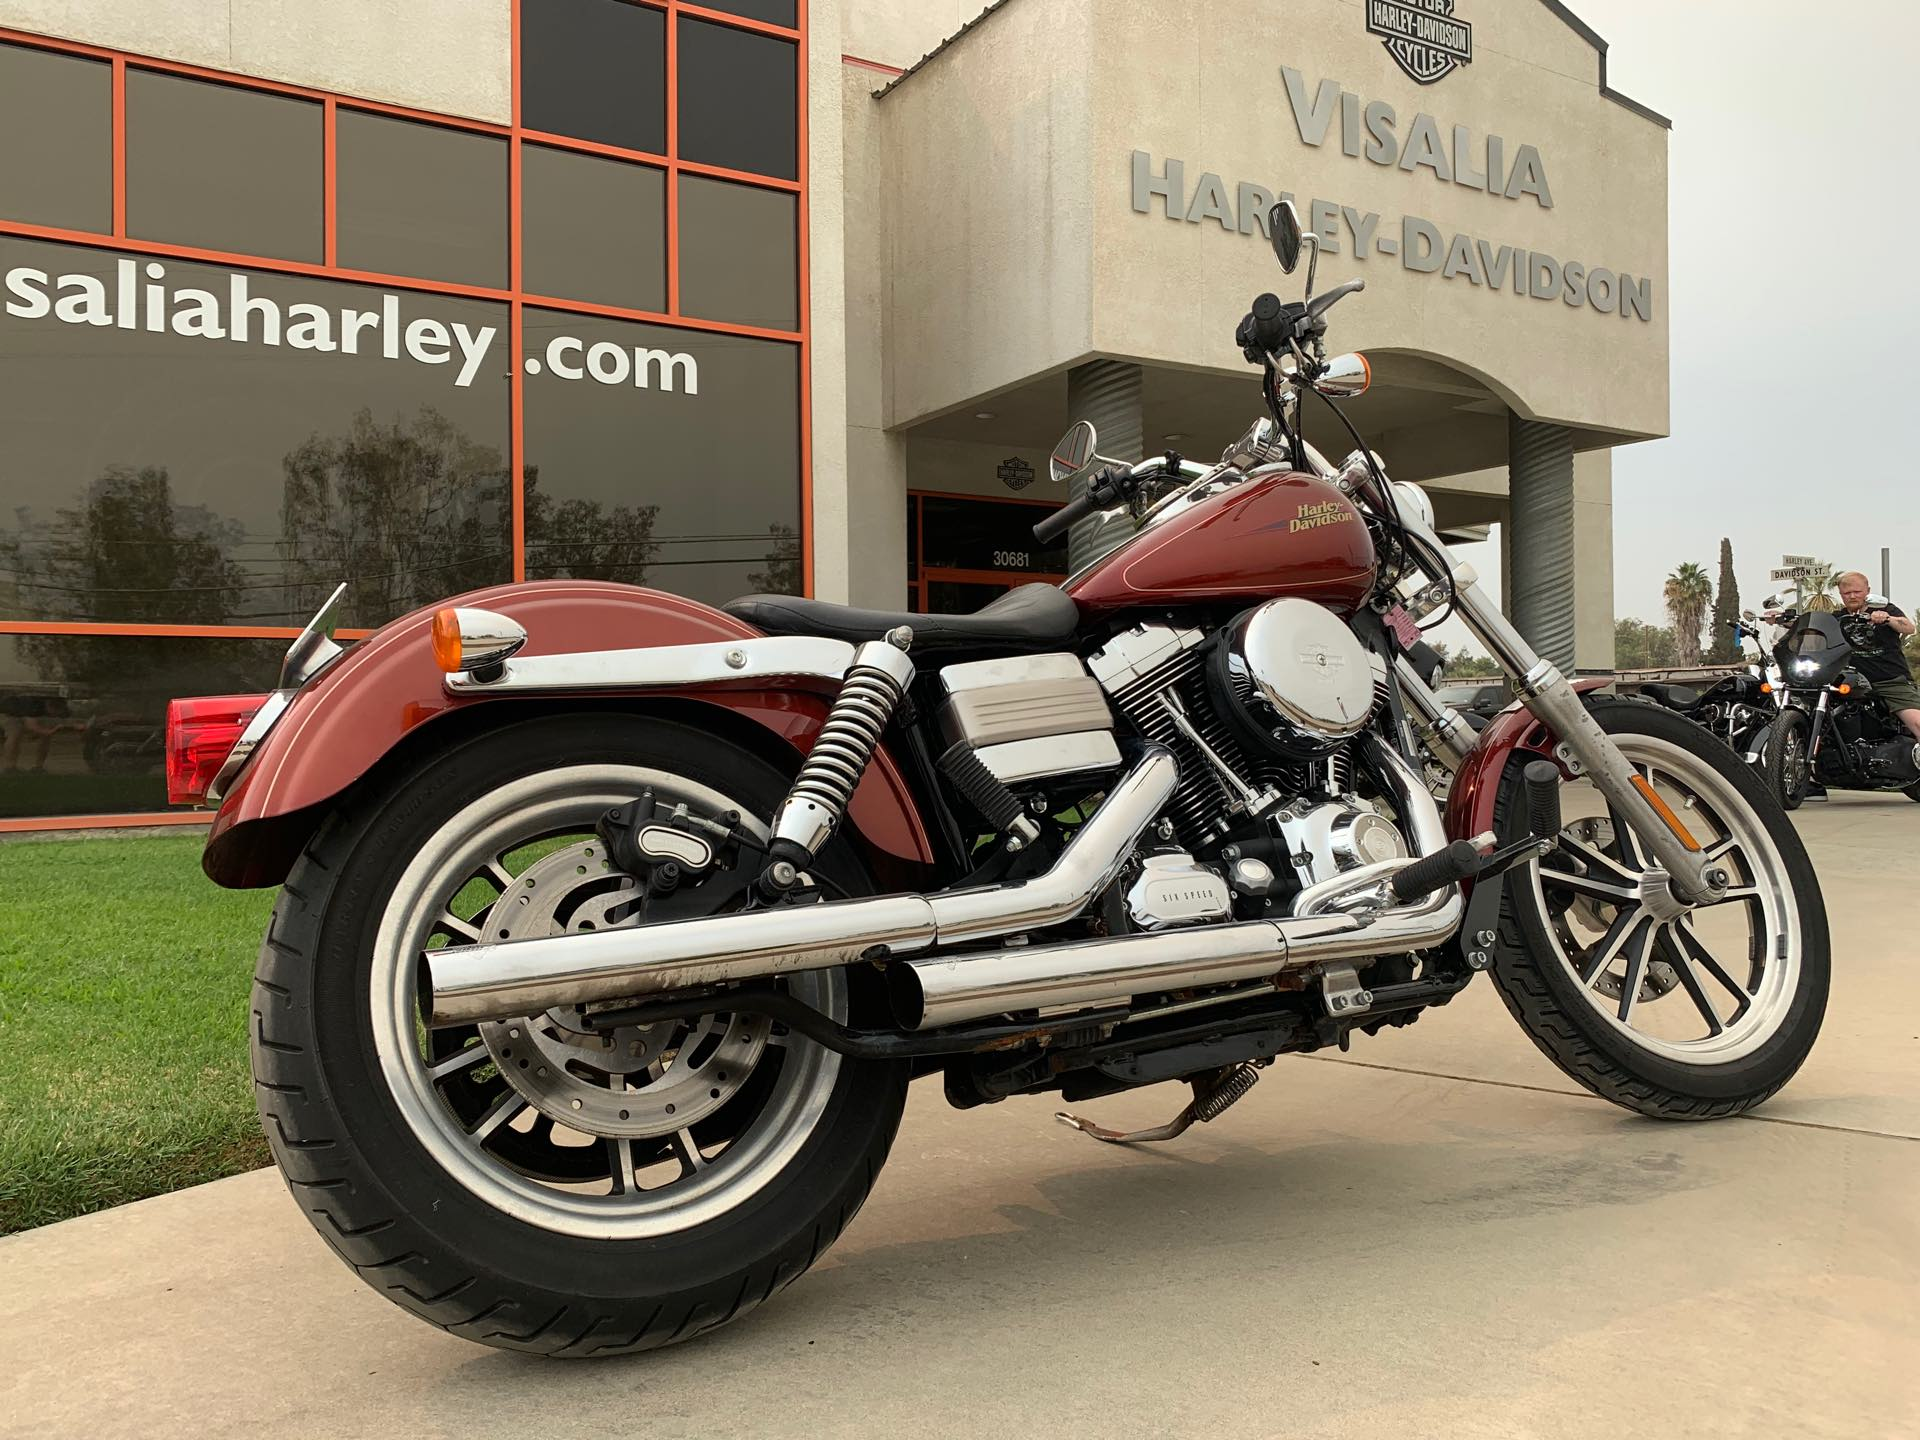 2009 Harley-Davidson Dyna Glide Low Rider at Visalia Harley-Davidson